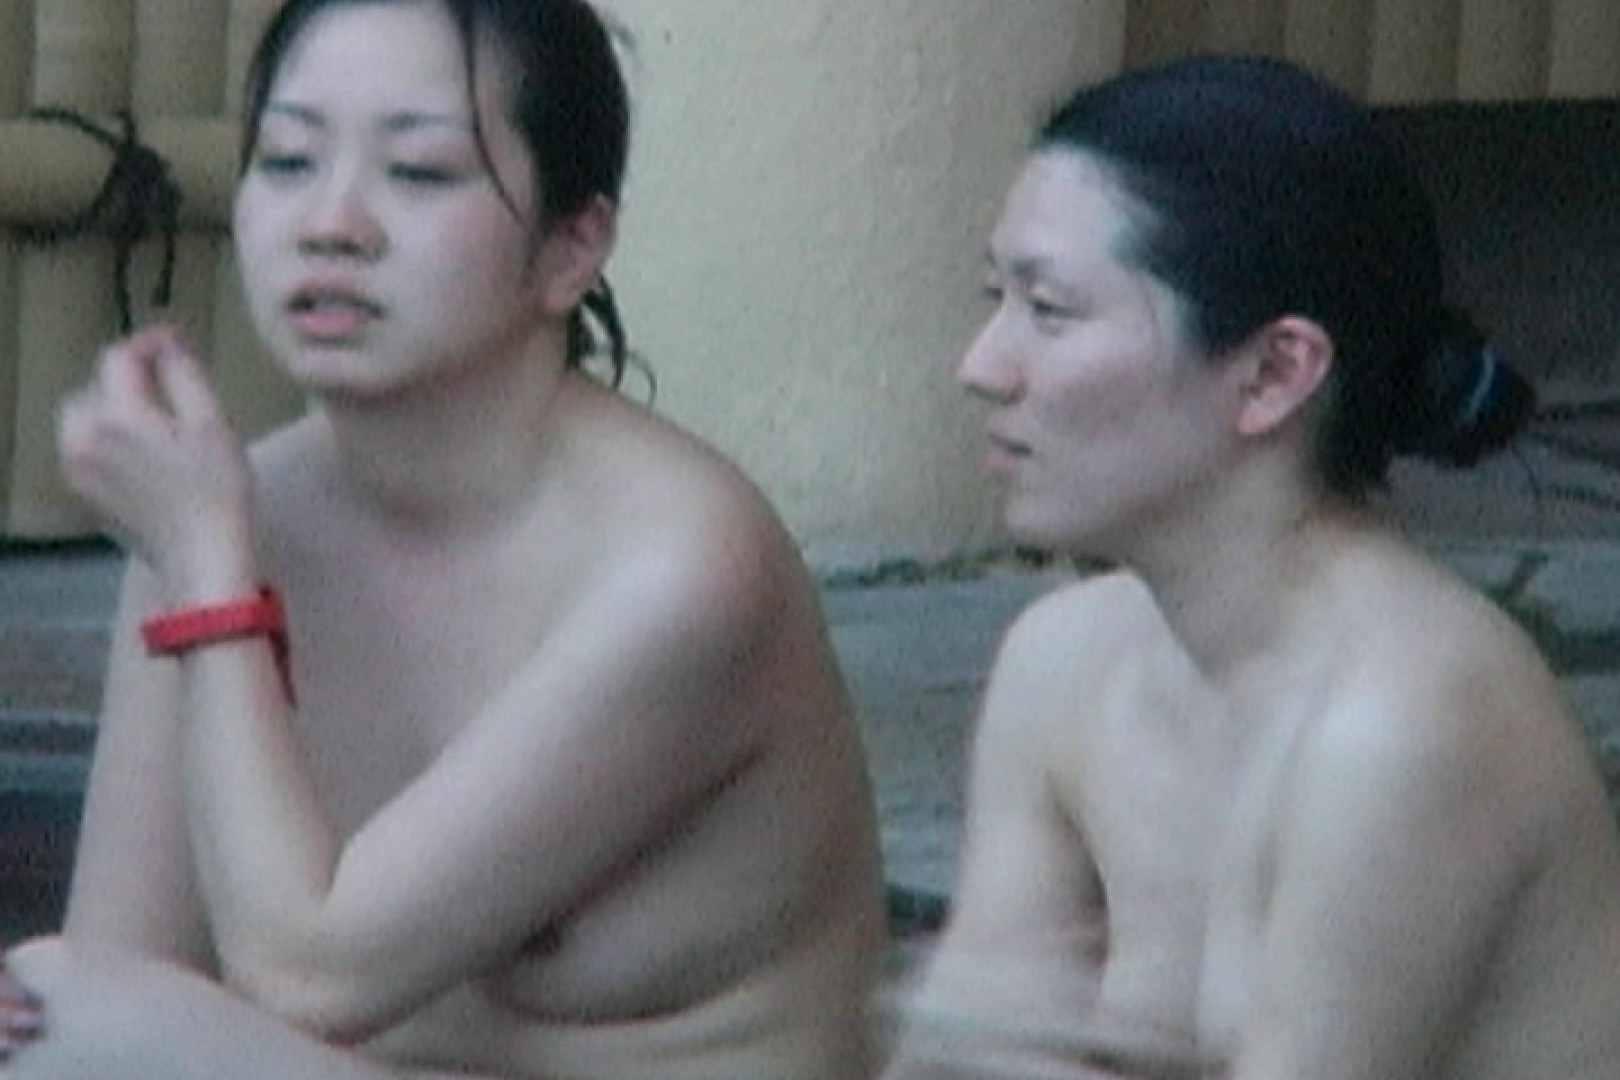 Aquaな露天風呂Vol.598 盗撮 エロ無料画像 79画像 41